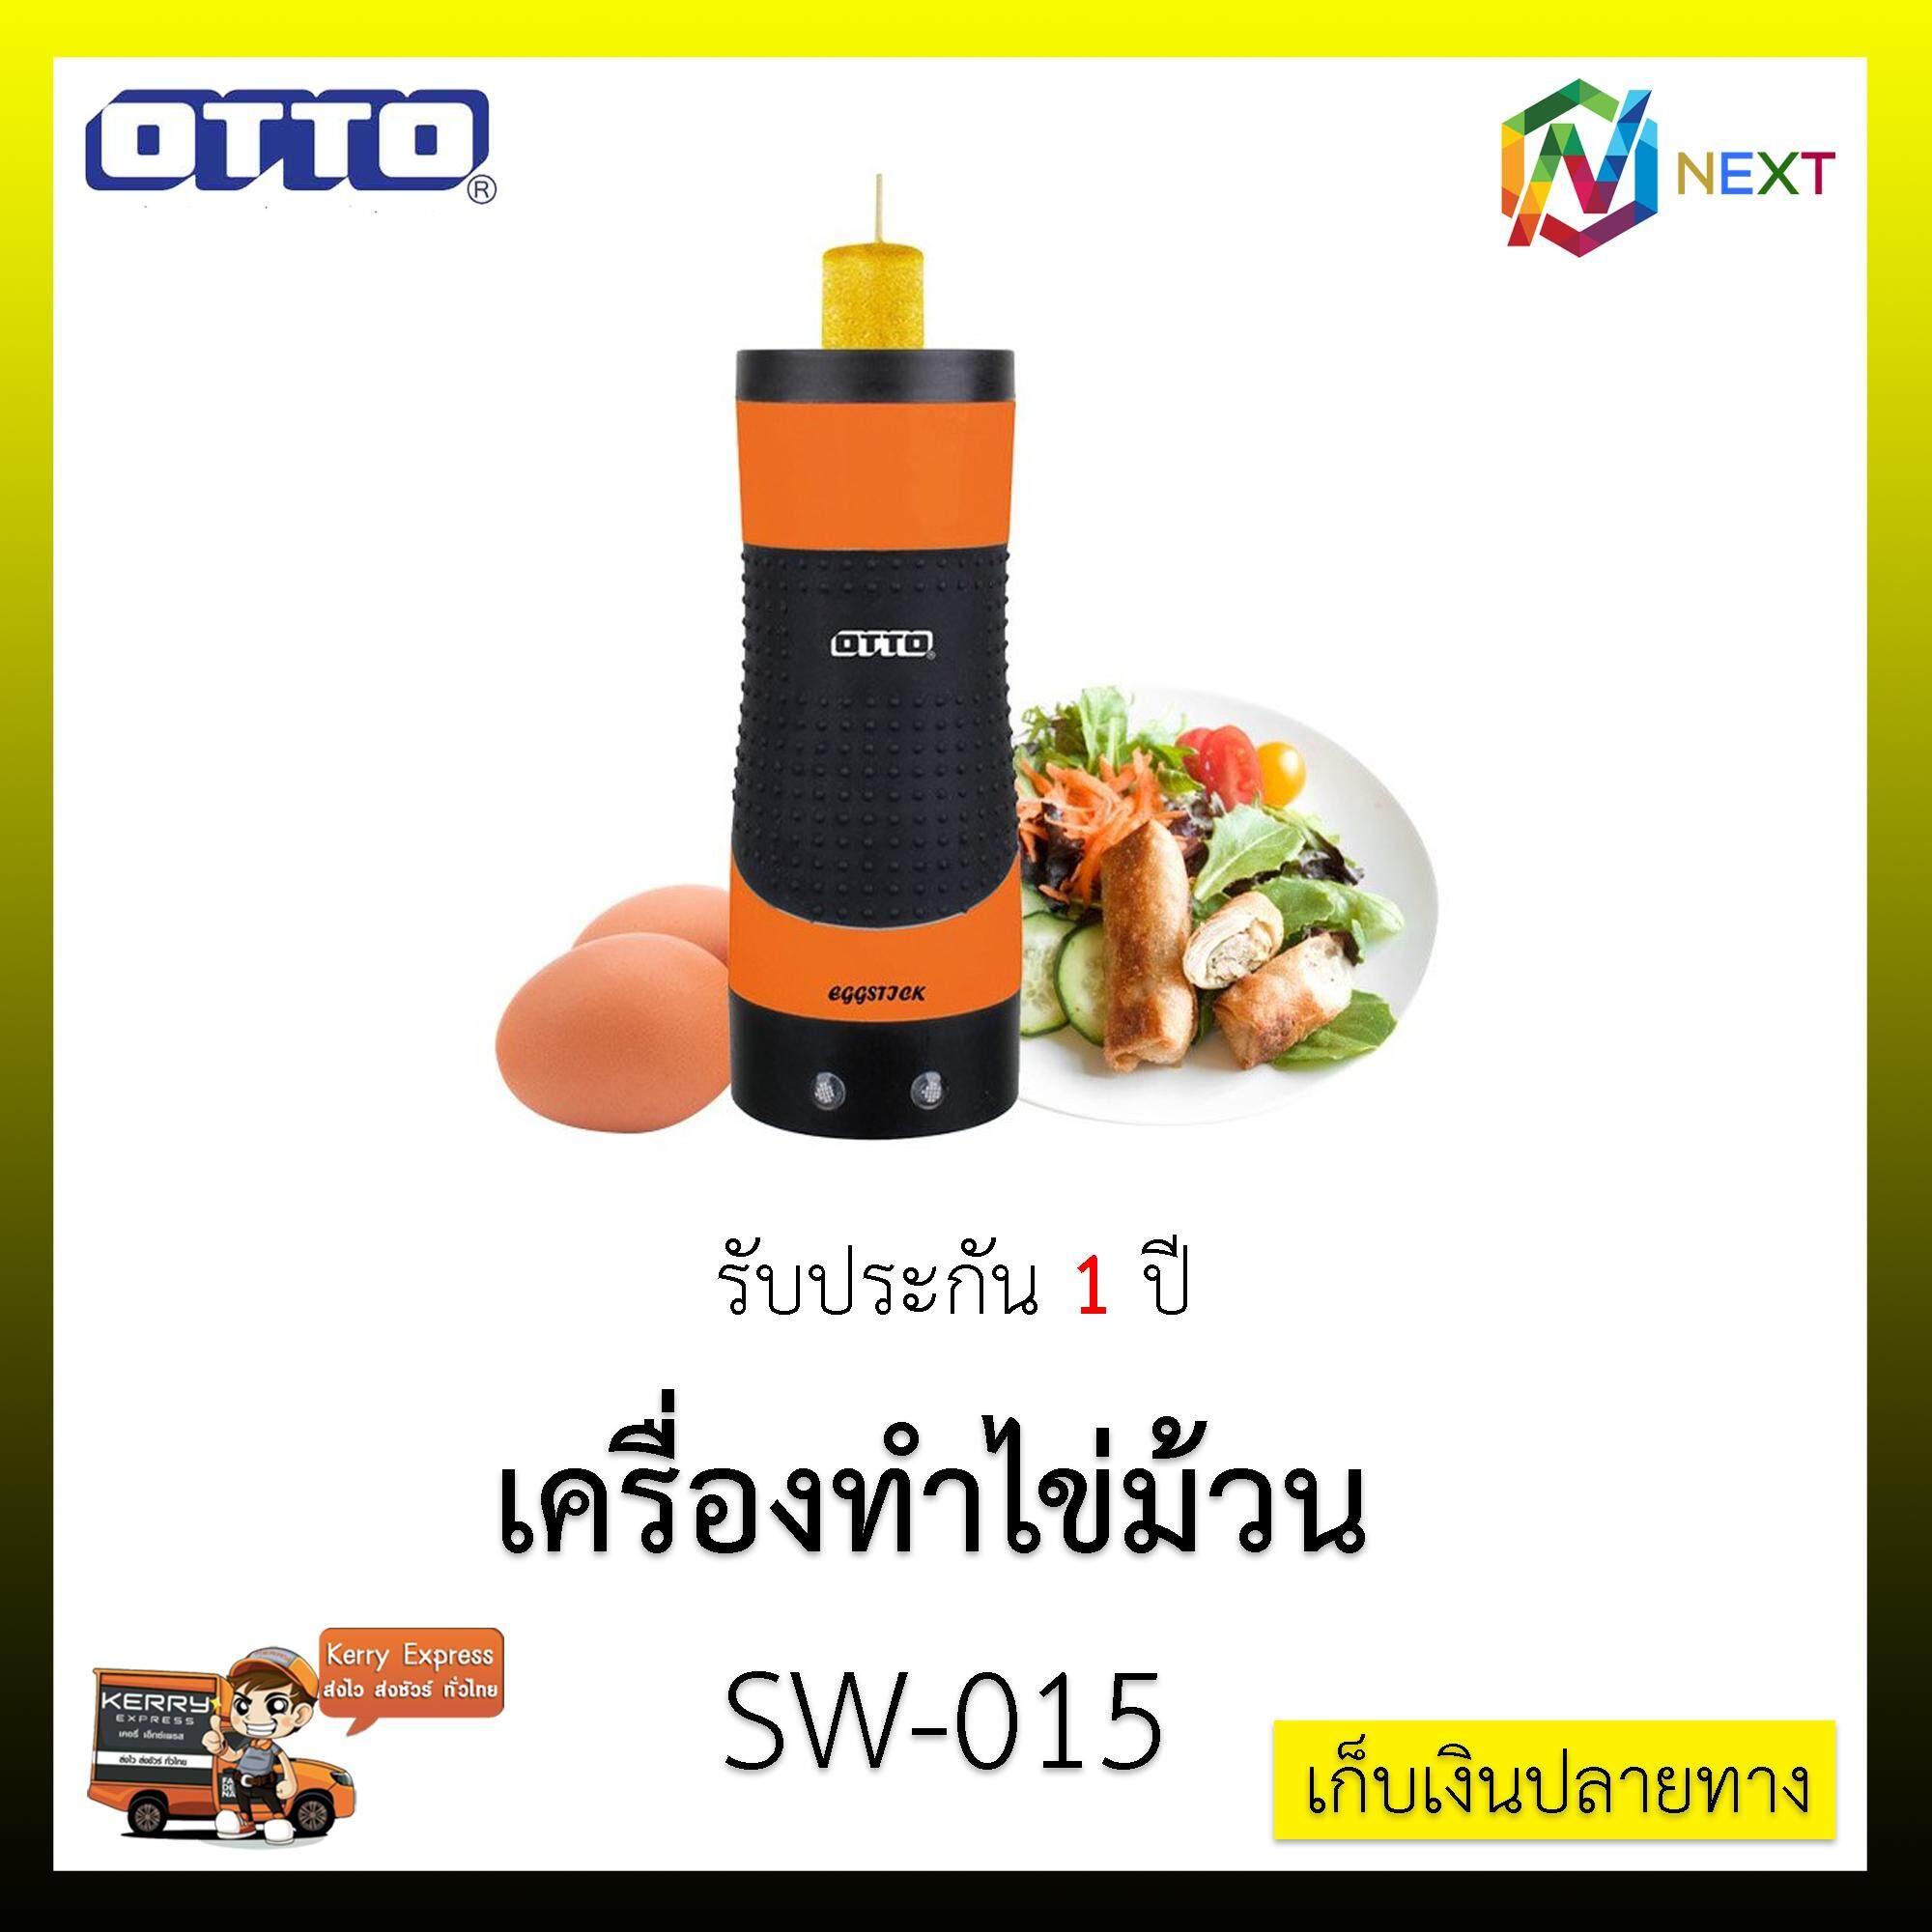 [OTTO] Egg Stick เครื่องทำไข่ม้วน รุ่น SW-015